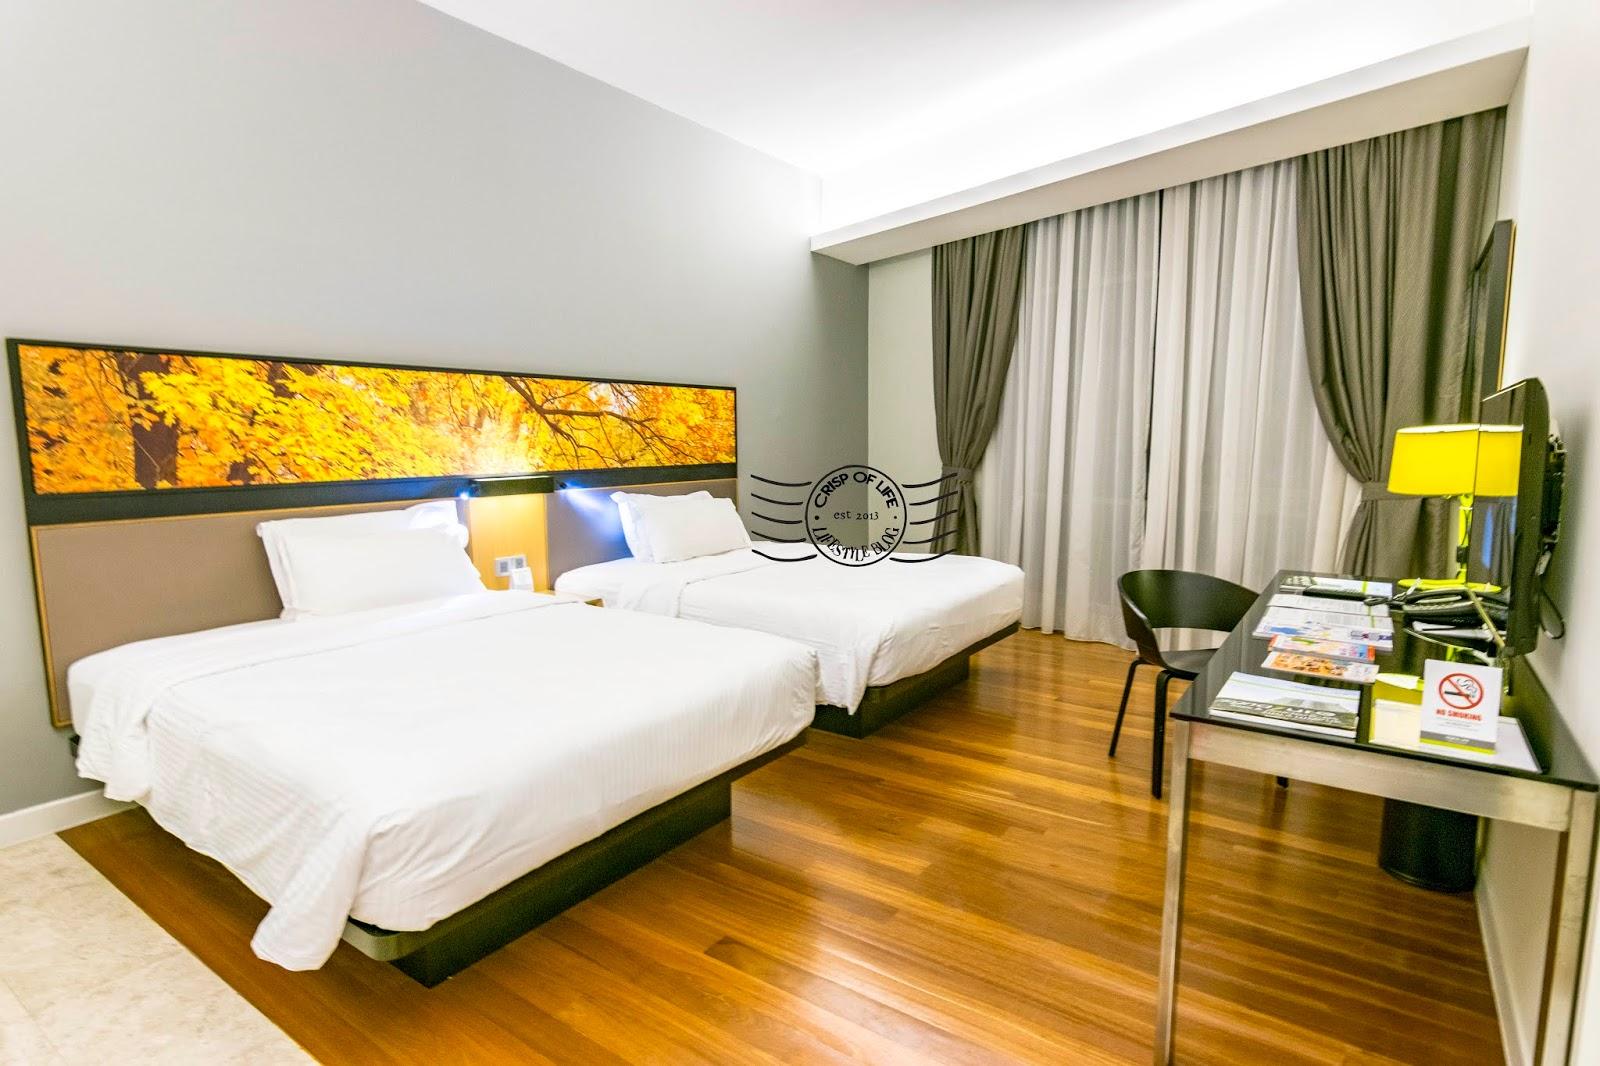 The Signature Hotel & Serviced Suites Kuala Lumpur @ Mont Kiara